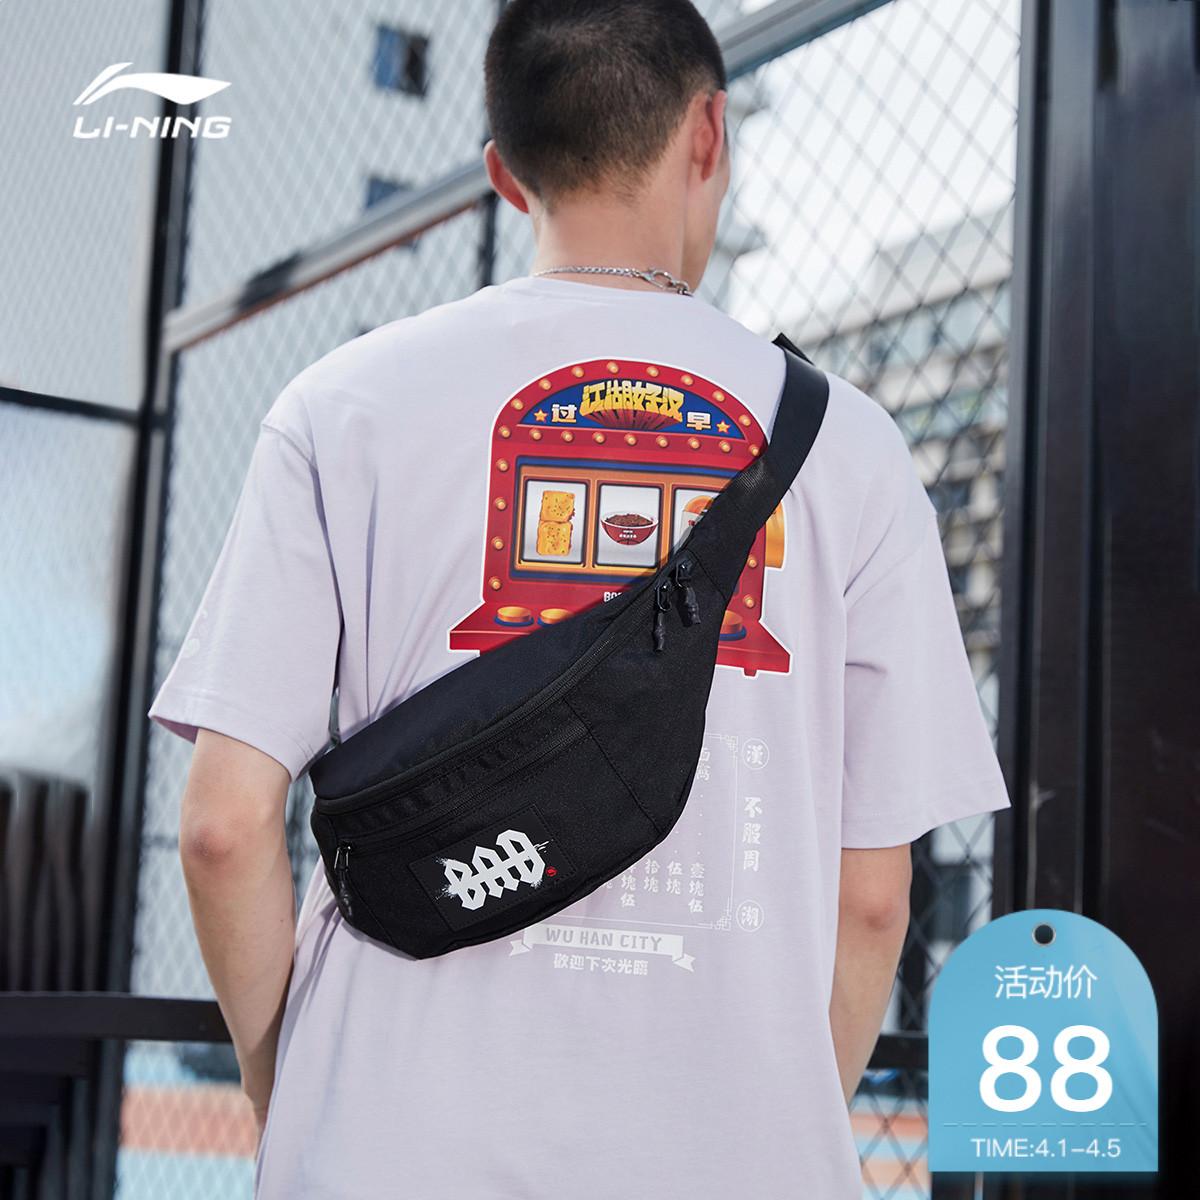 Li Ning one-shoulder bag waist bag mens bag womens bag BADIVE basketball series fashion leisure sports bag